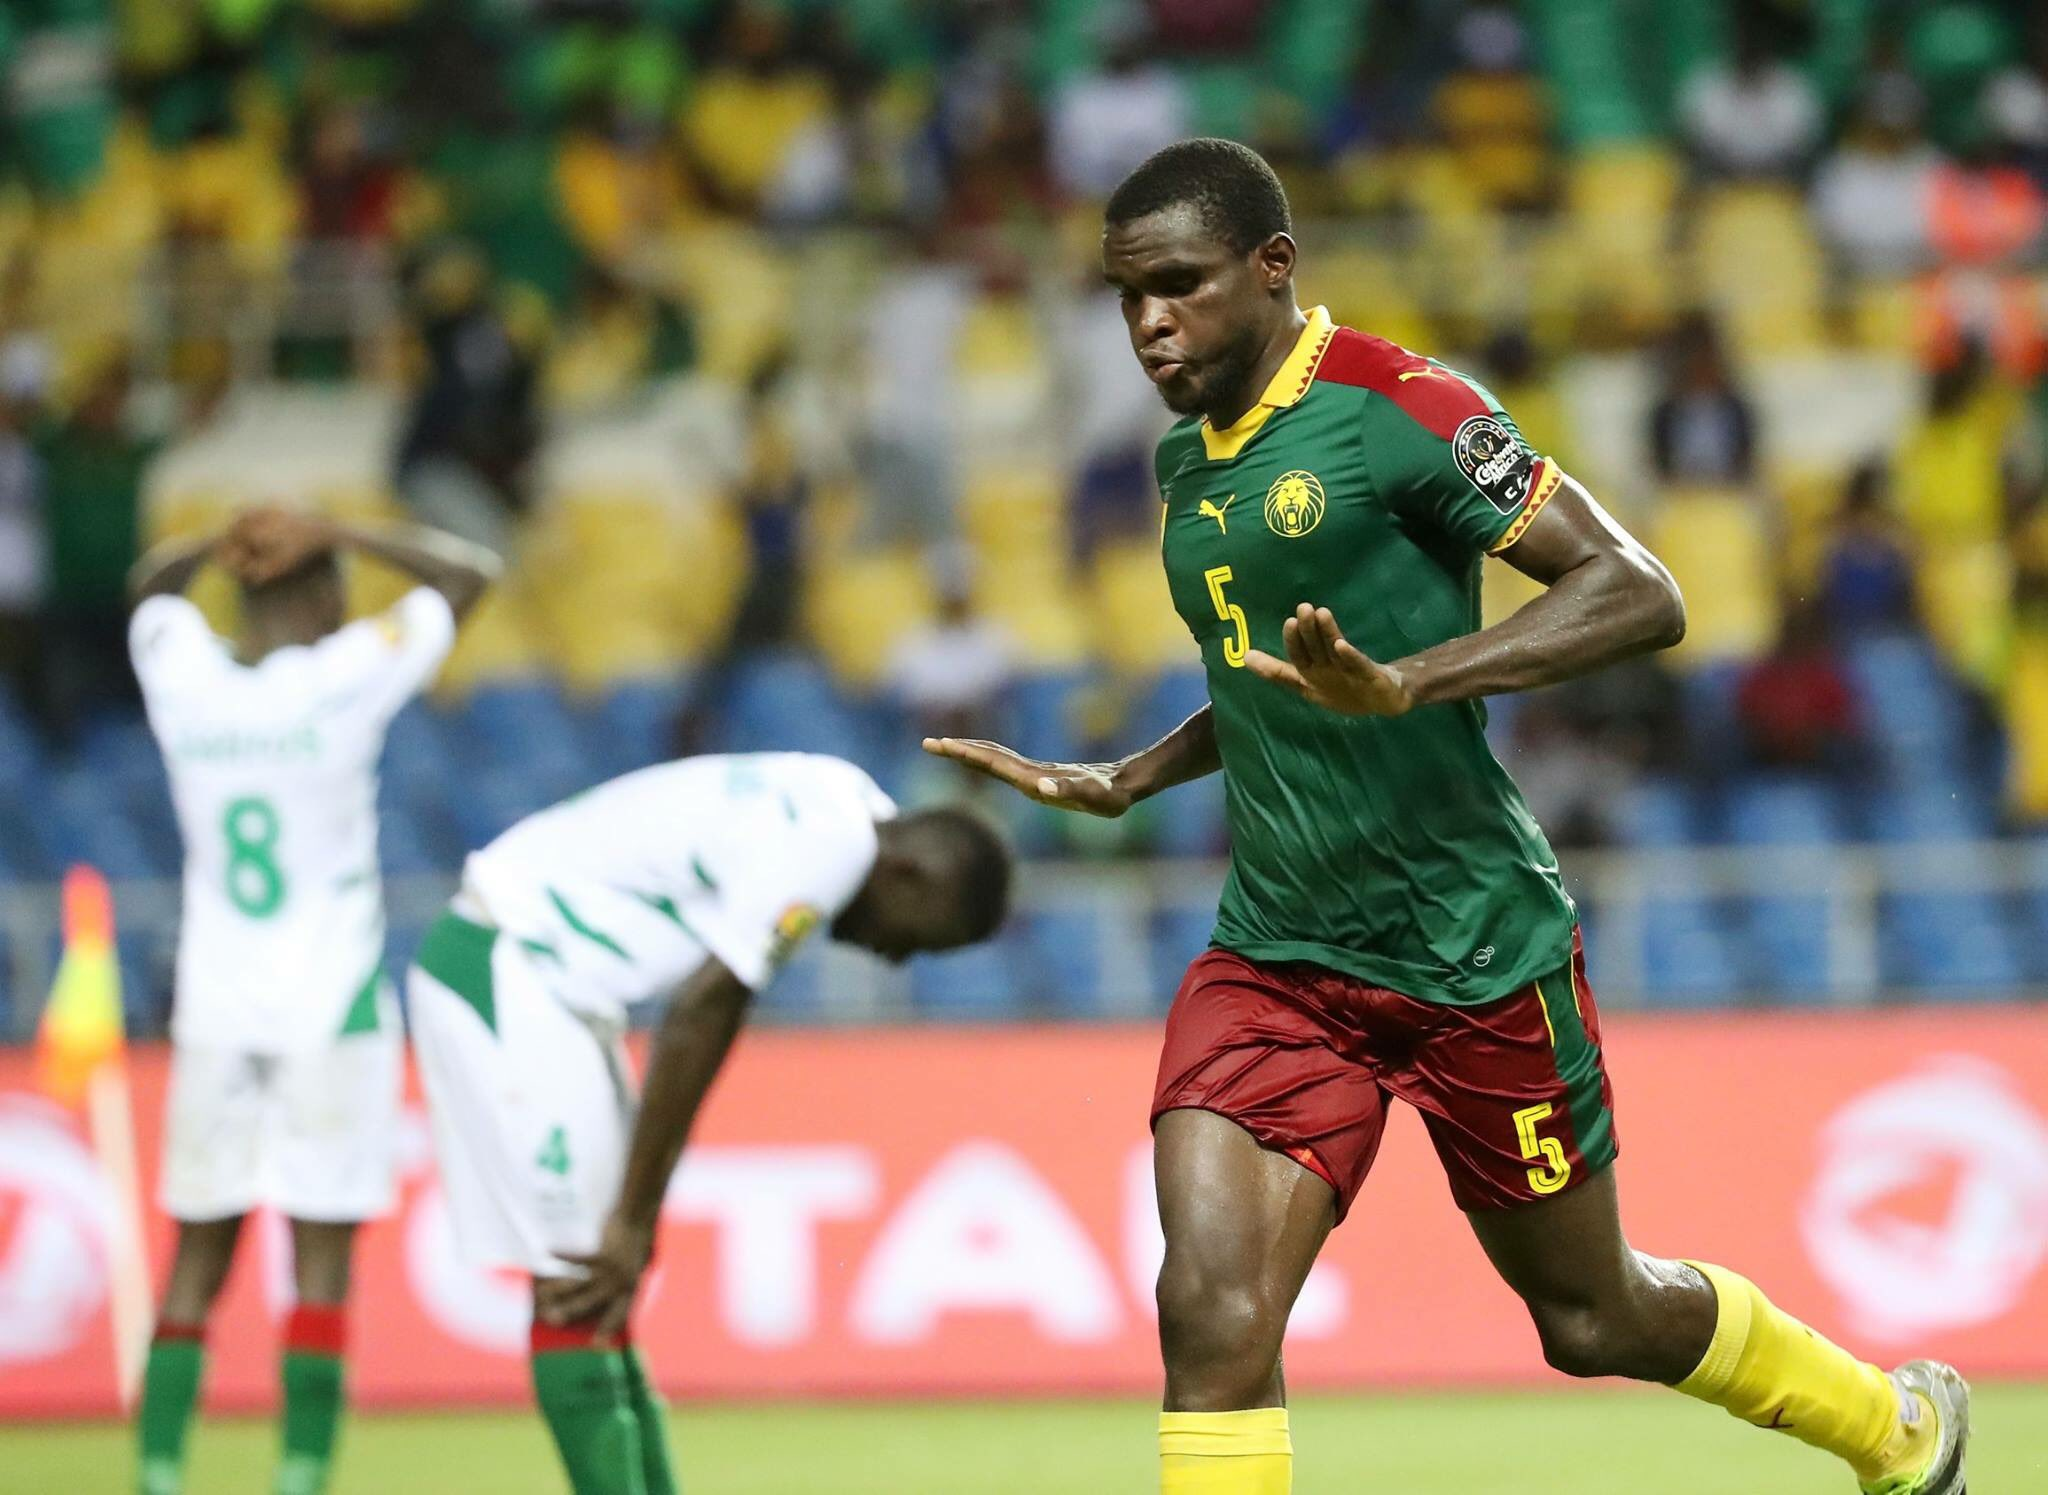 AFCON: Mane Misses Penalty As Cameroon Stop Senegal, Reach Semis